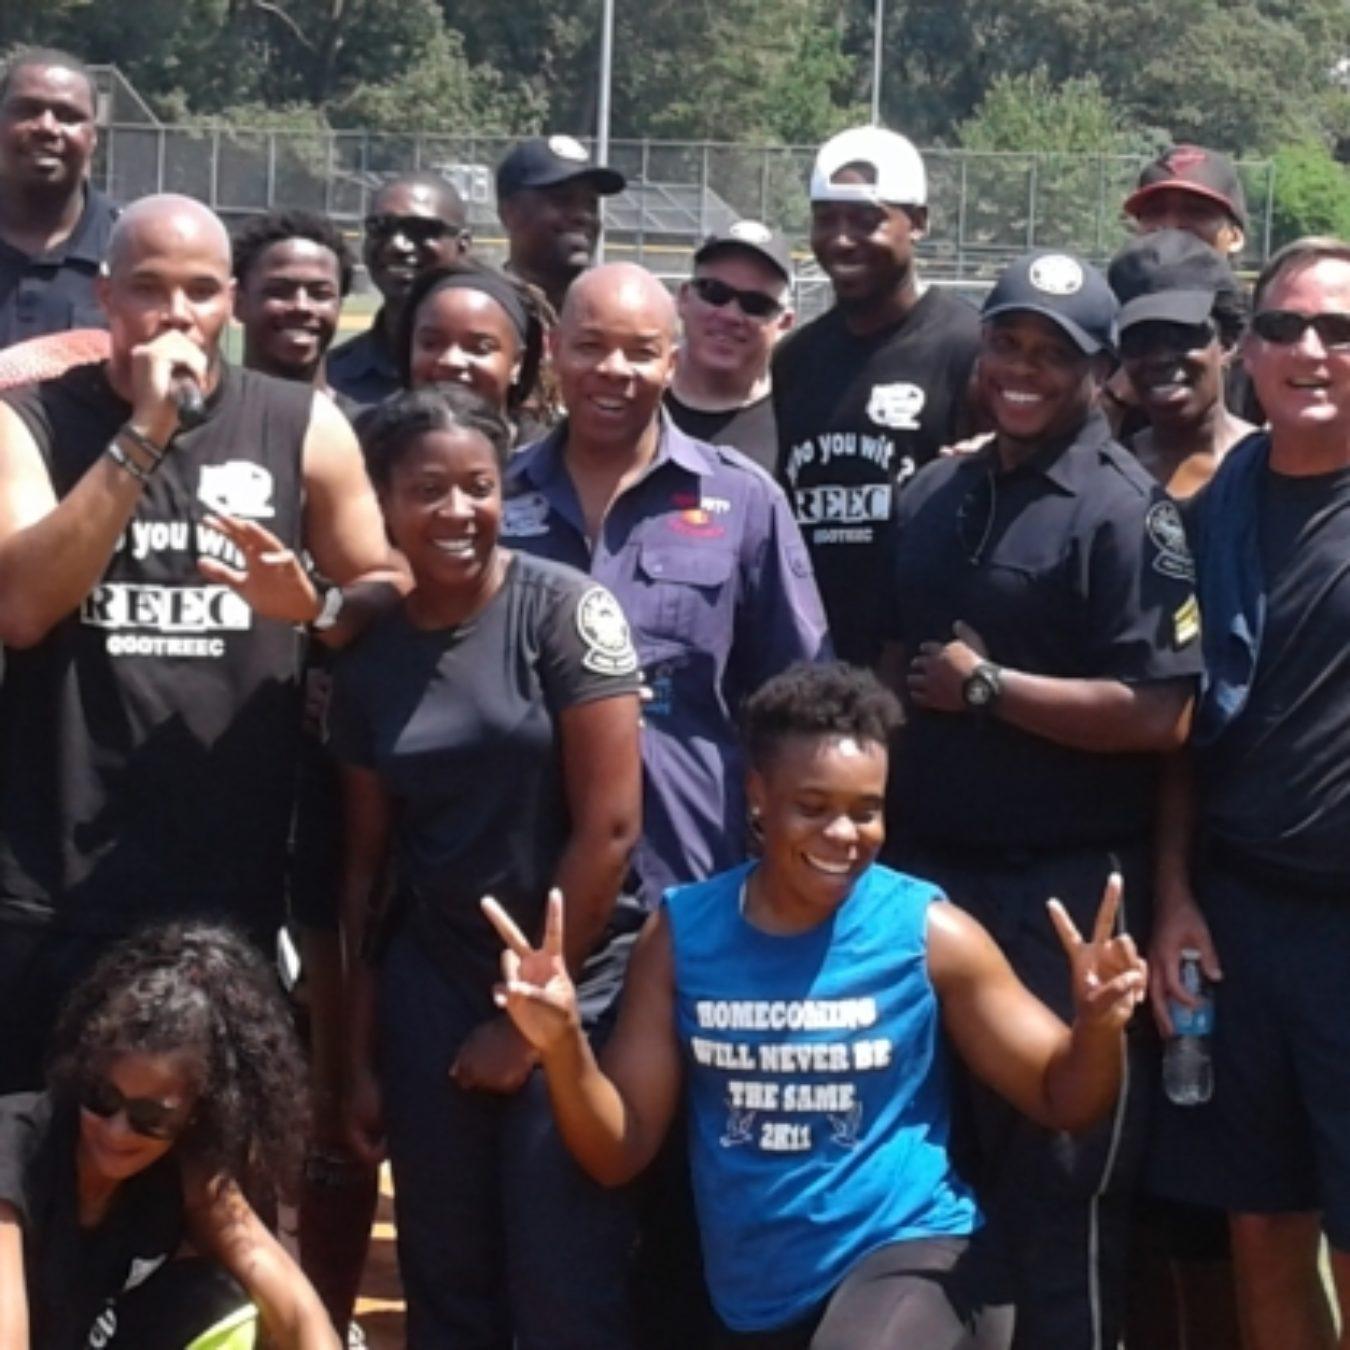 cops Vs Campers kickball challenge host by Reec (13)